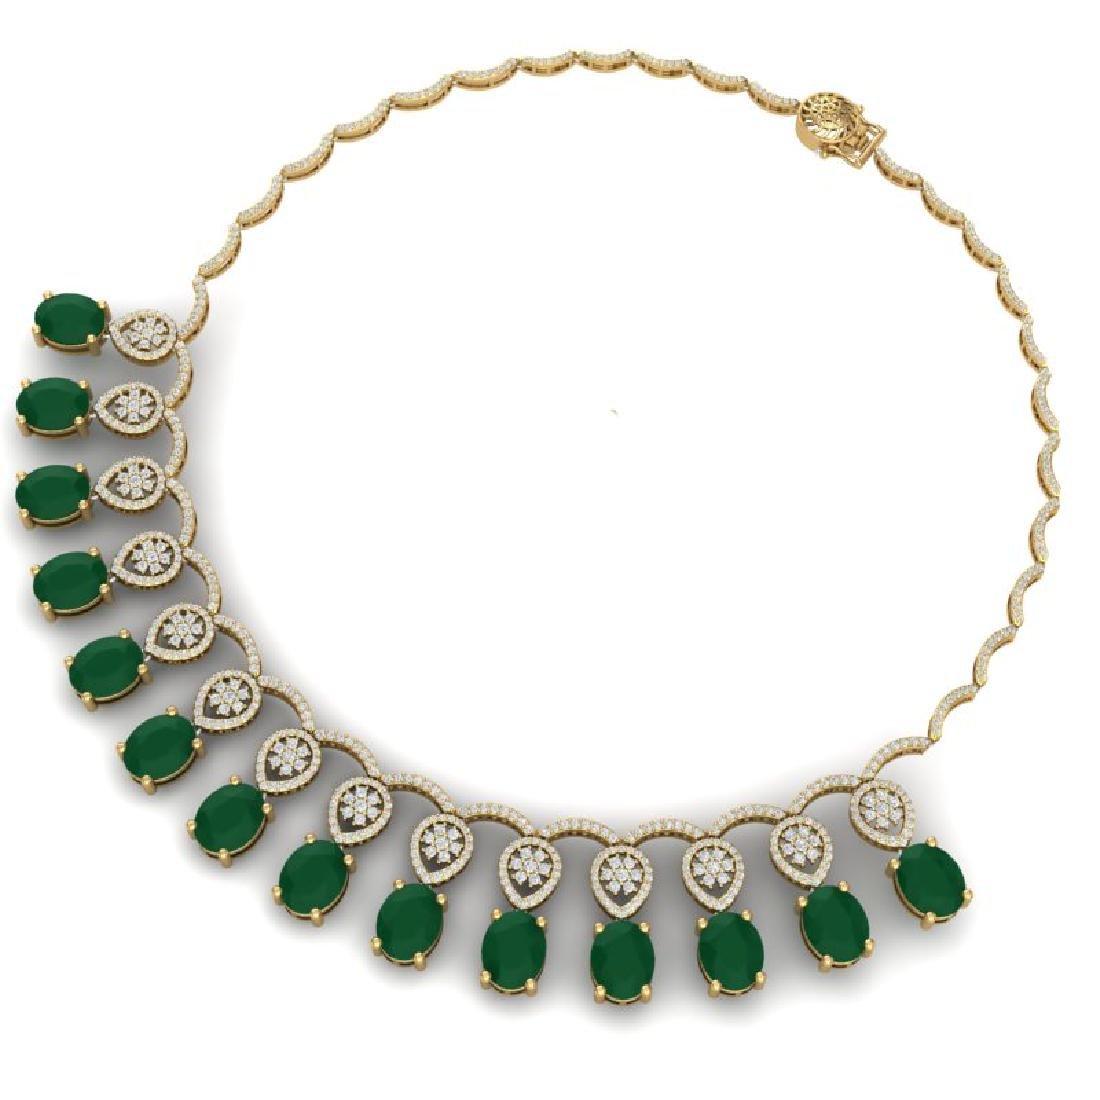 54.05 CTW Royalty Emerald & VS Diamond Necklace 18K - 3